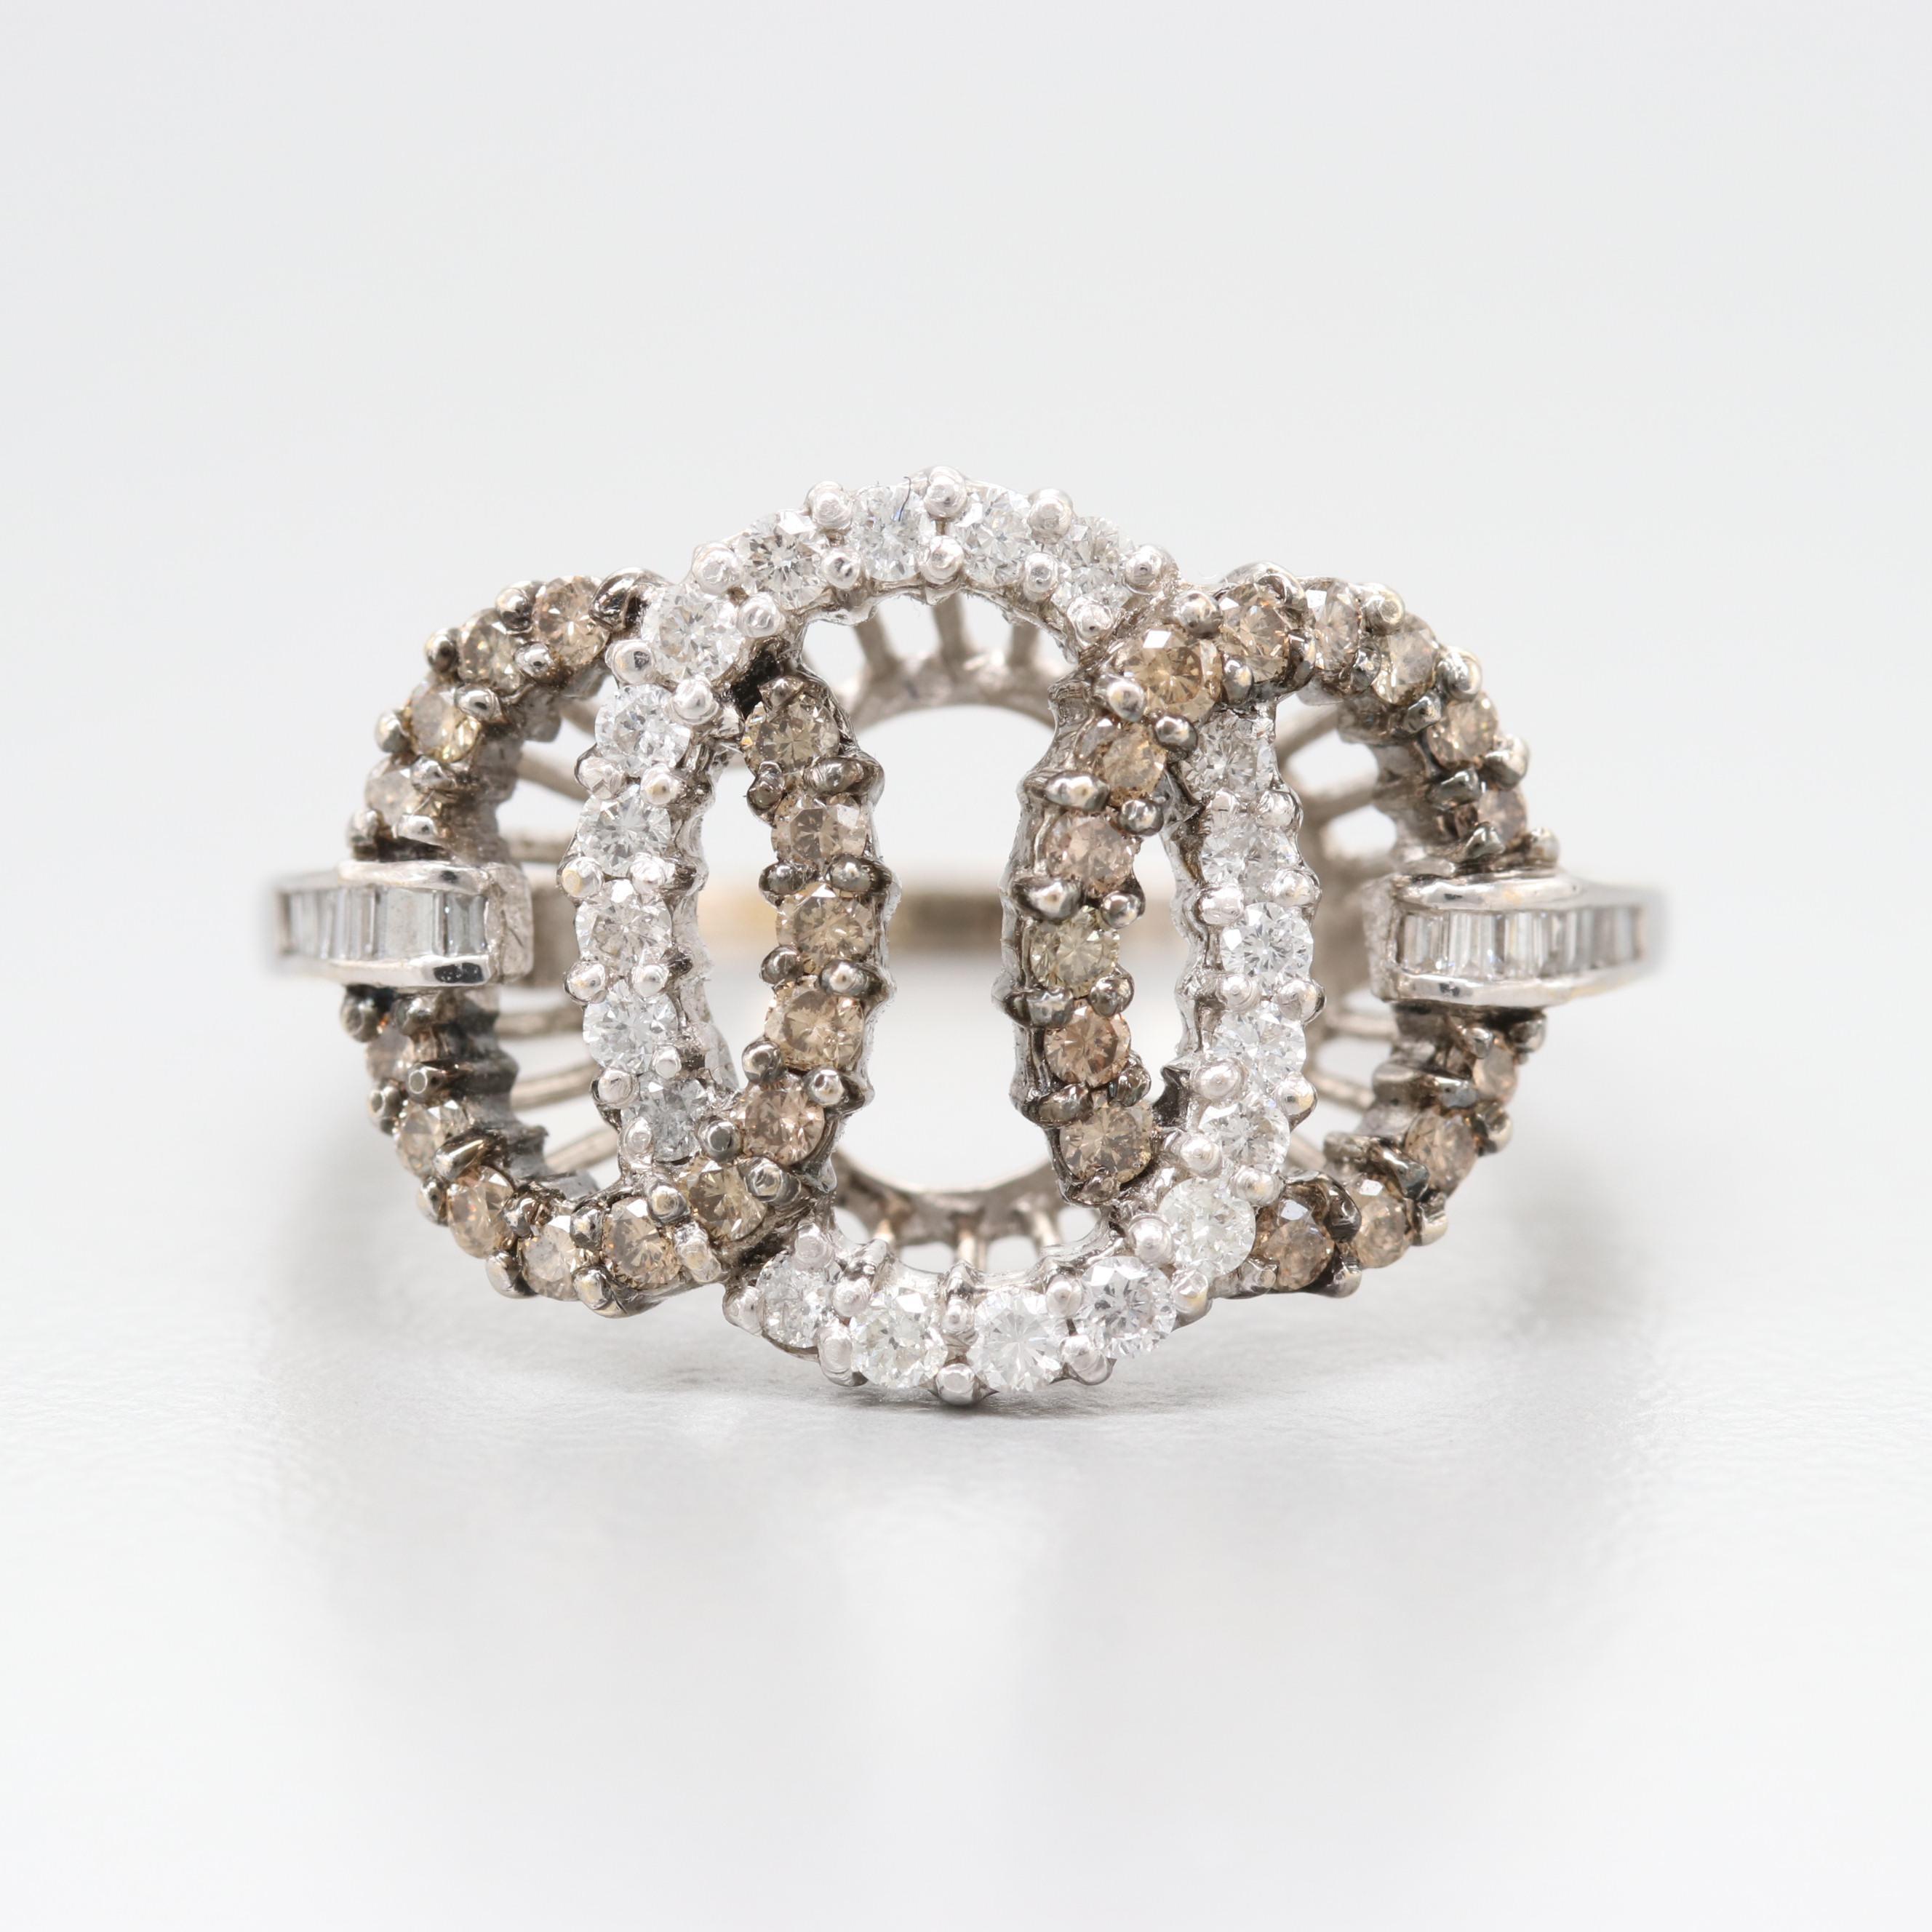 18K White Gold Diamond Geometric Band with Brown Diamonds